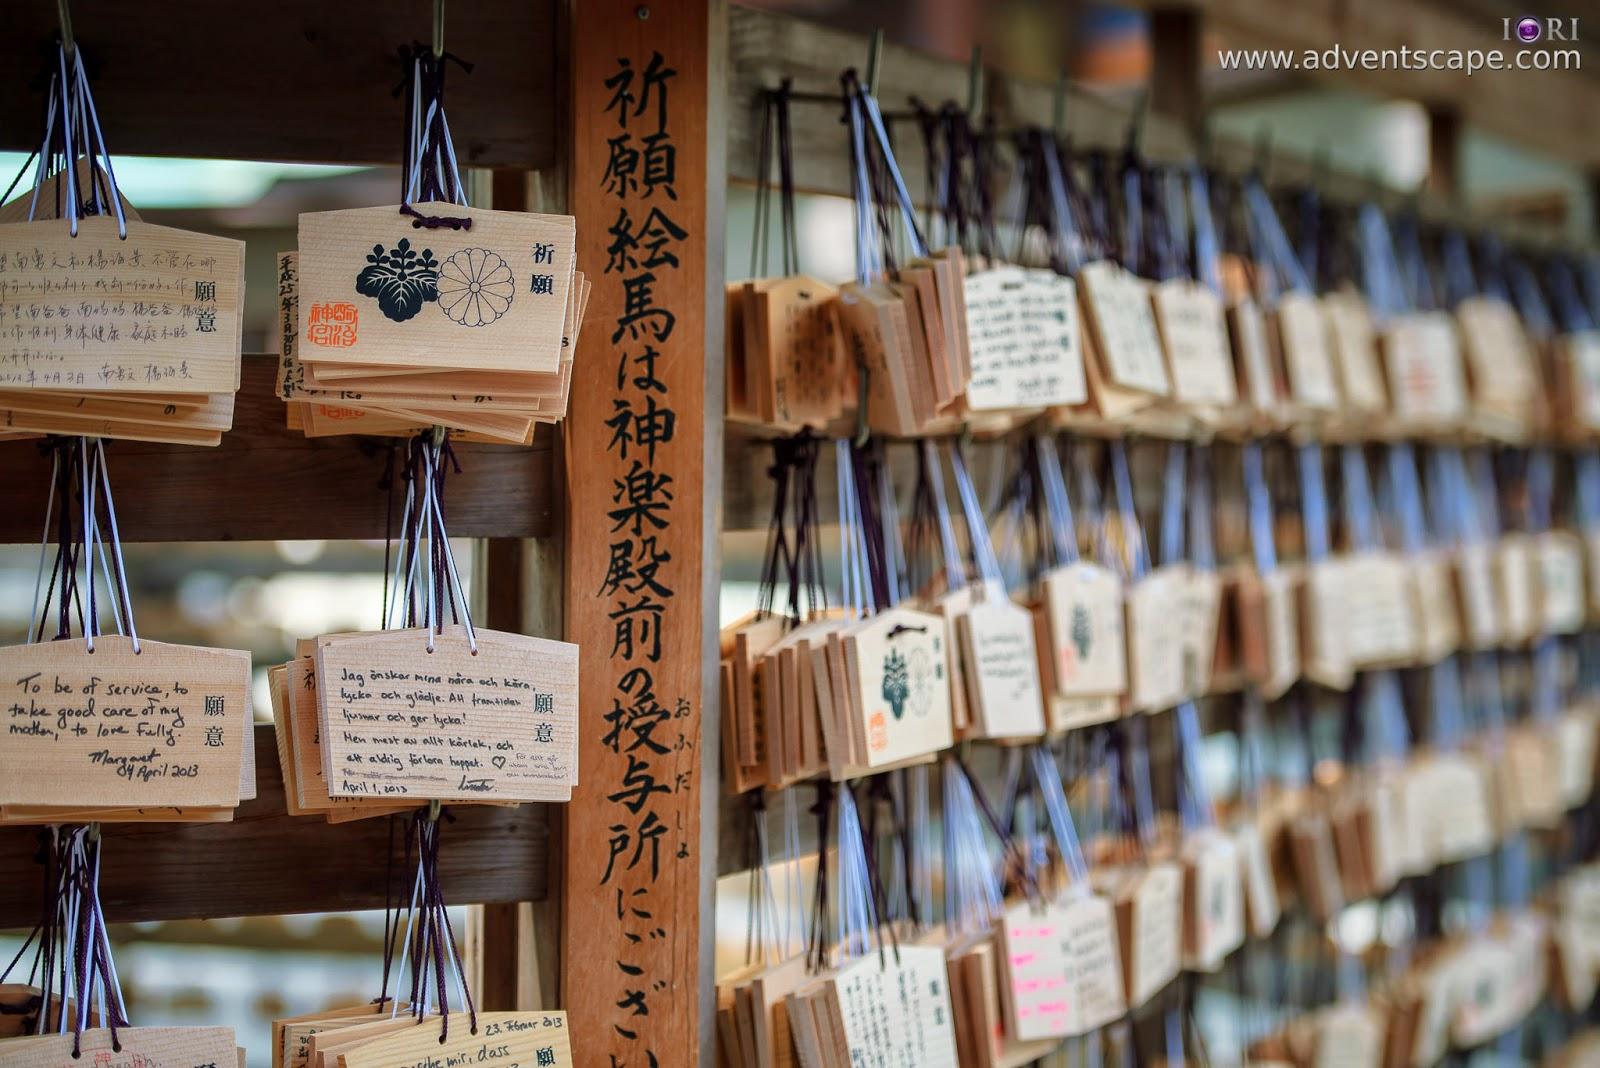 Asia, dedication, Japan, Land of the Rising Sun, letter, Meiji temple, Philip Avellana, prayer, Senso-Ji, temple, Tokyo, tourism